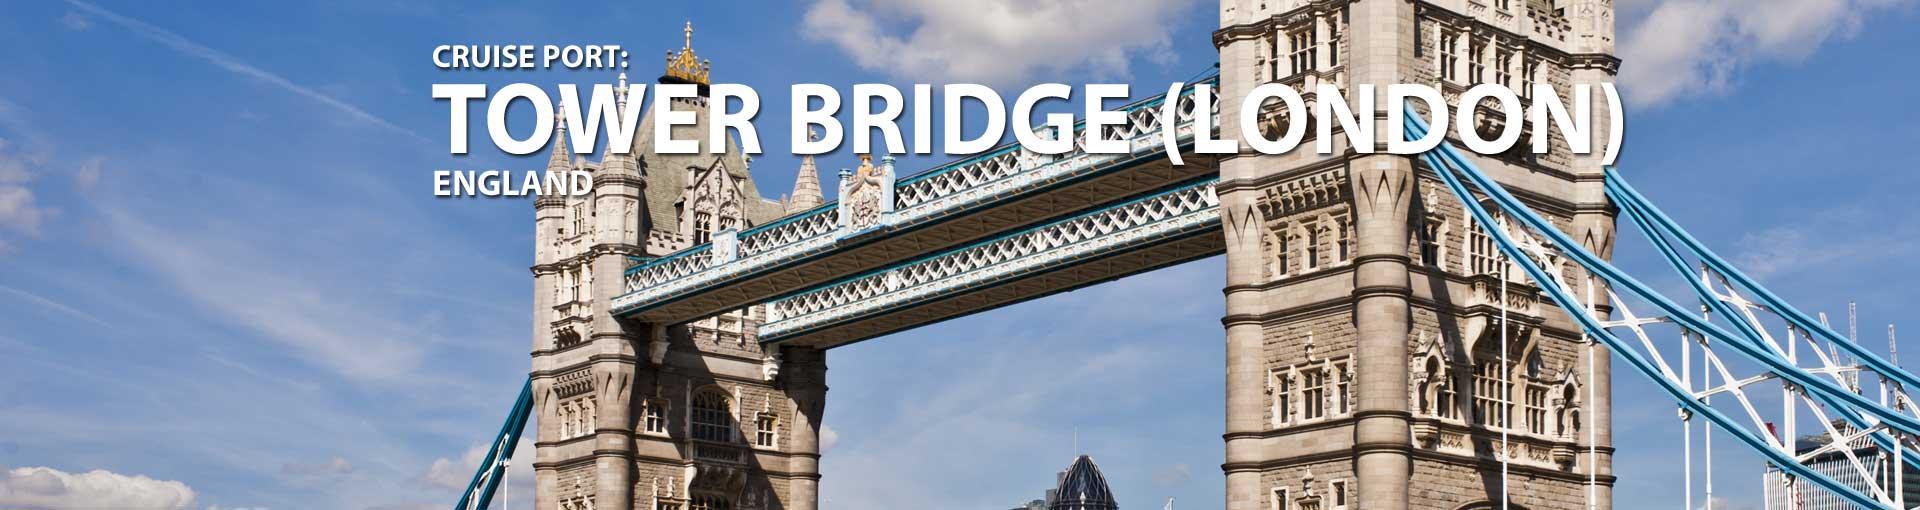 Tower Bridge, London Cruise Port